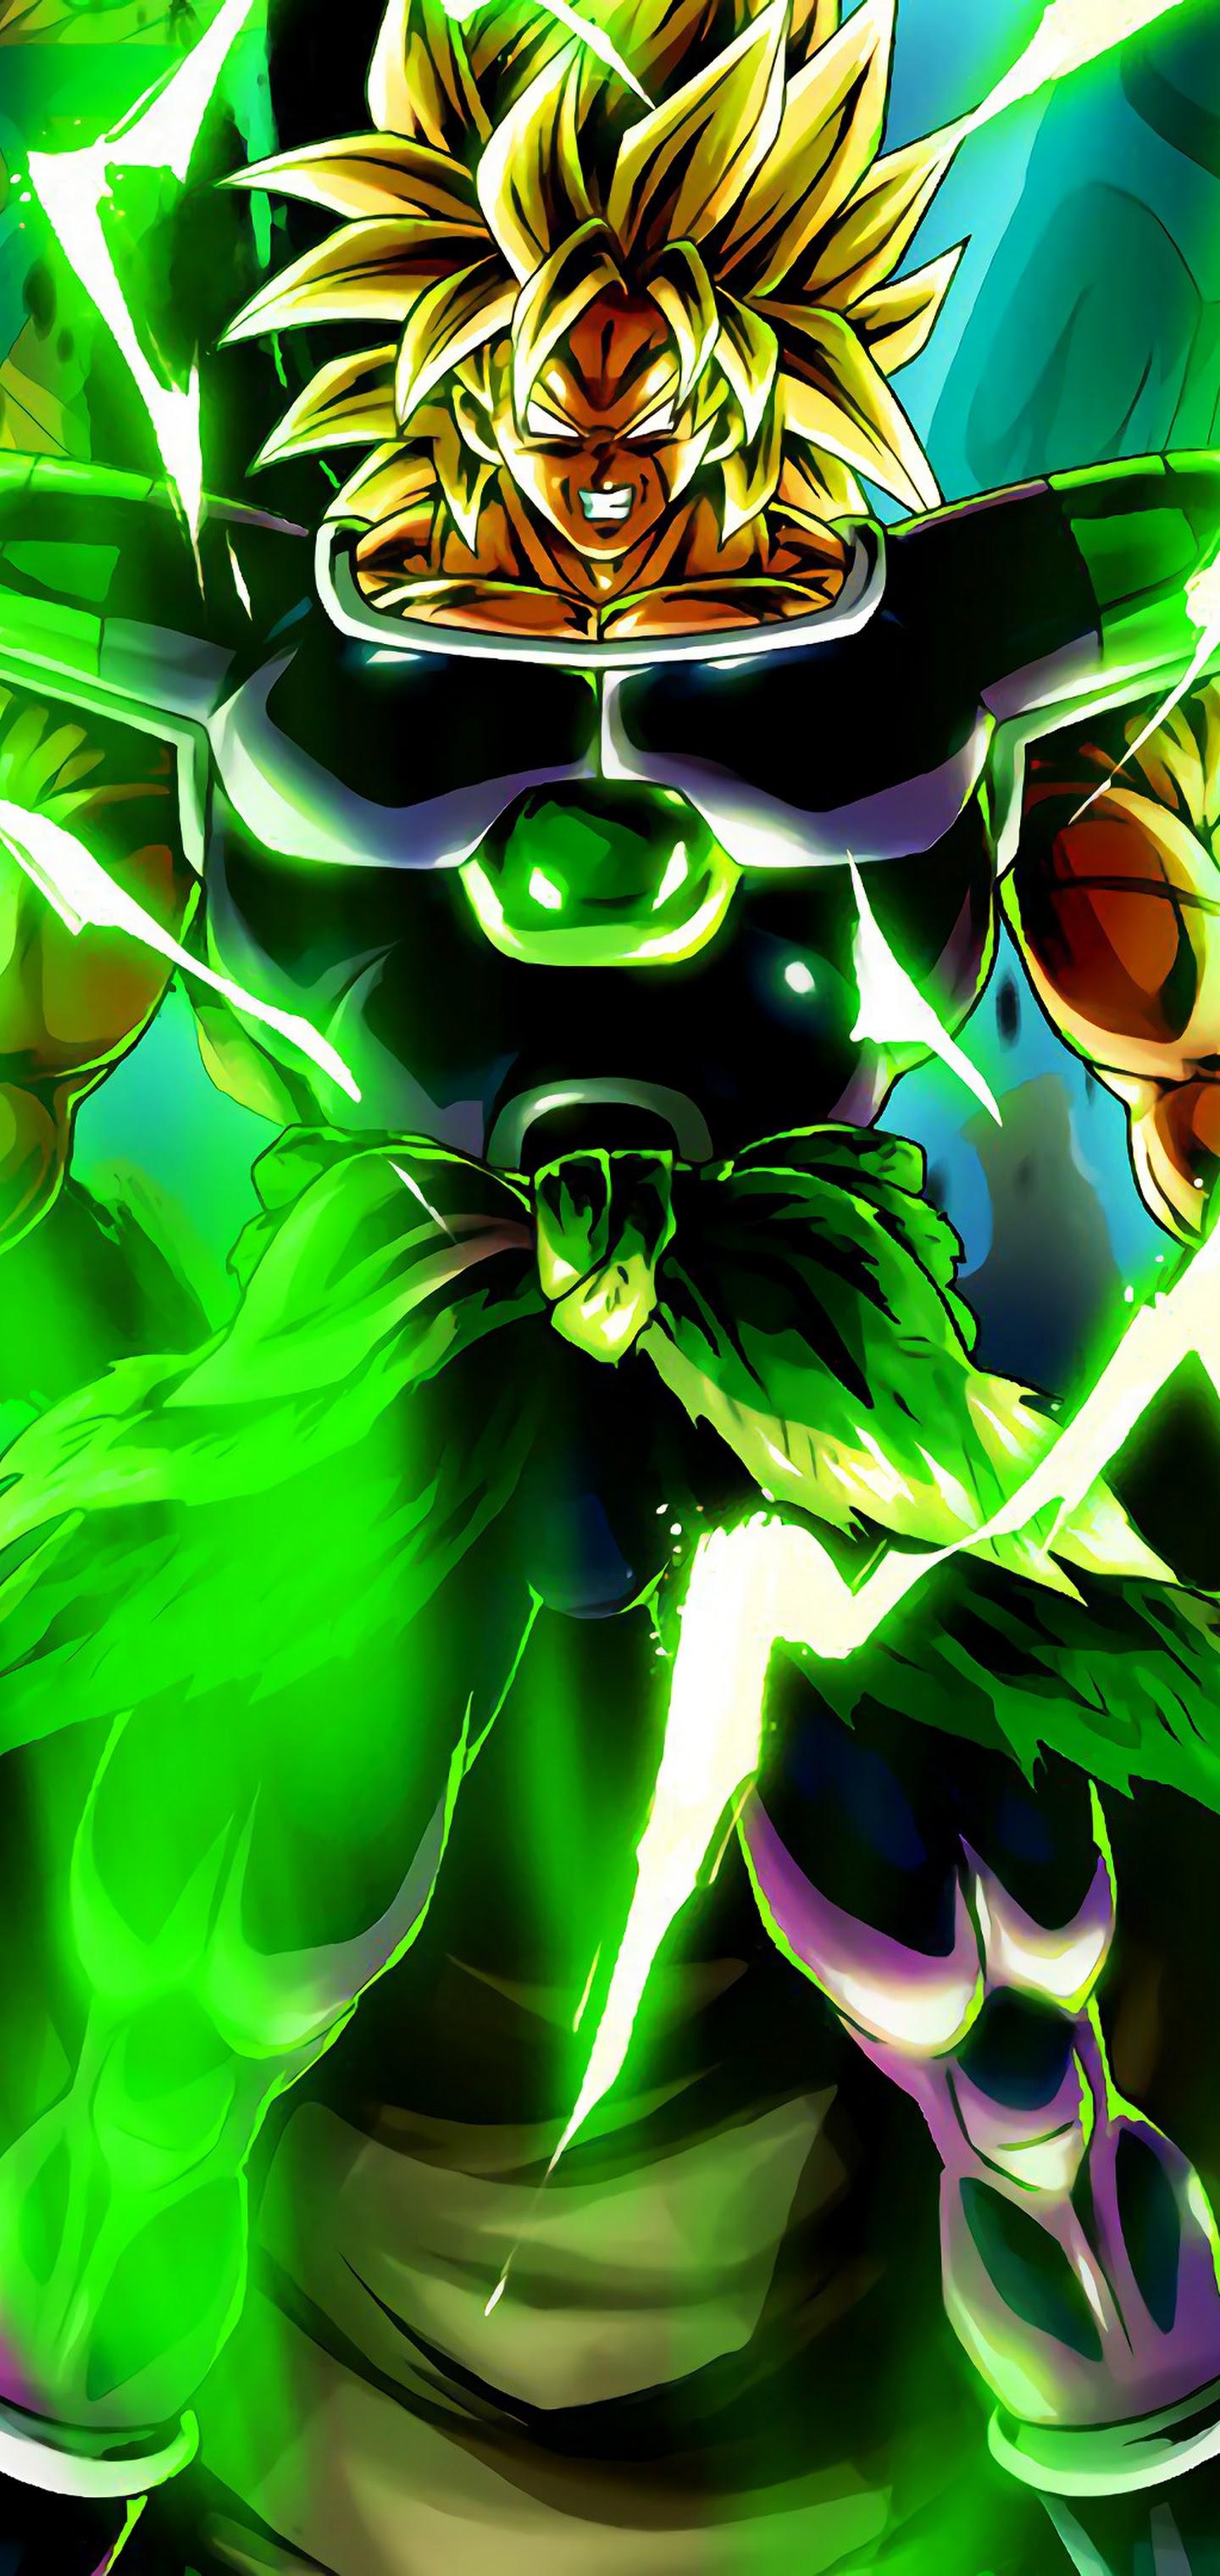 Broly Super Saiyan Dragon Ball Super Broly 4k 3840x2160